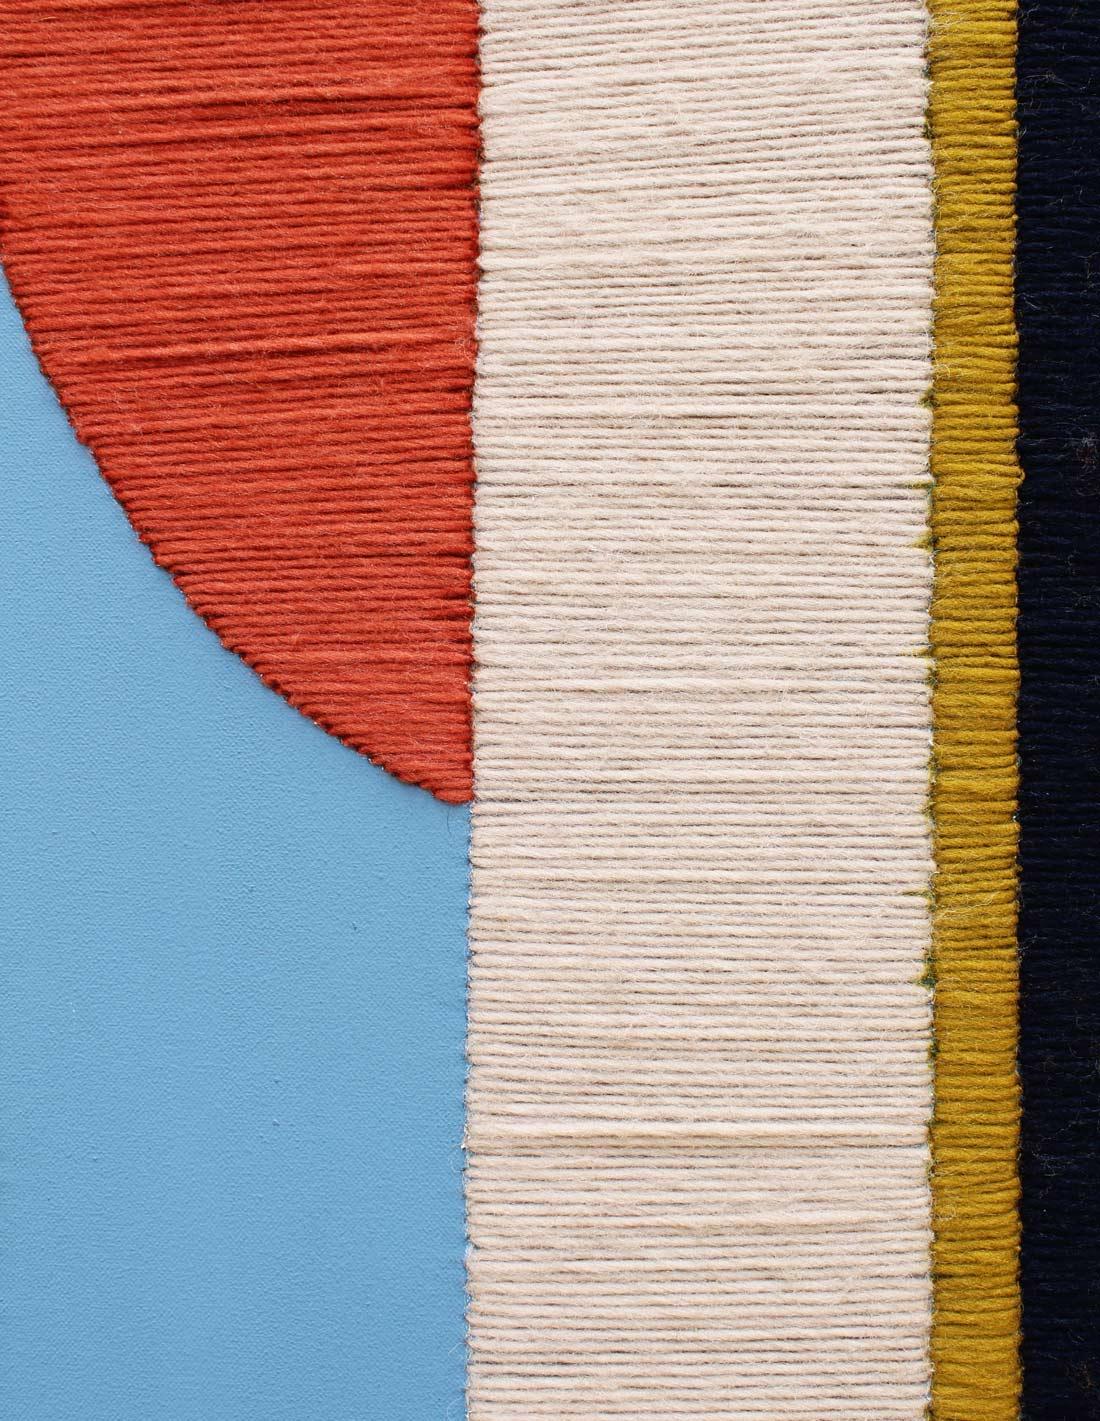 Blu-Geometric-Composition-close-up